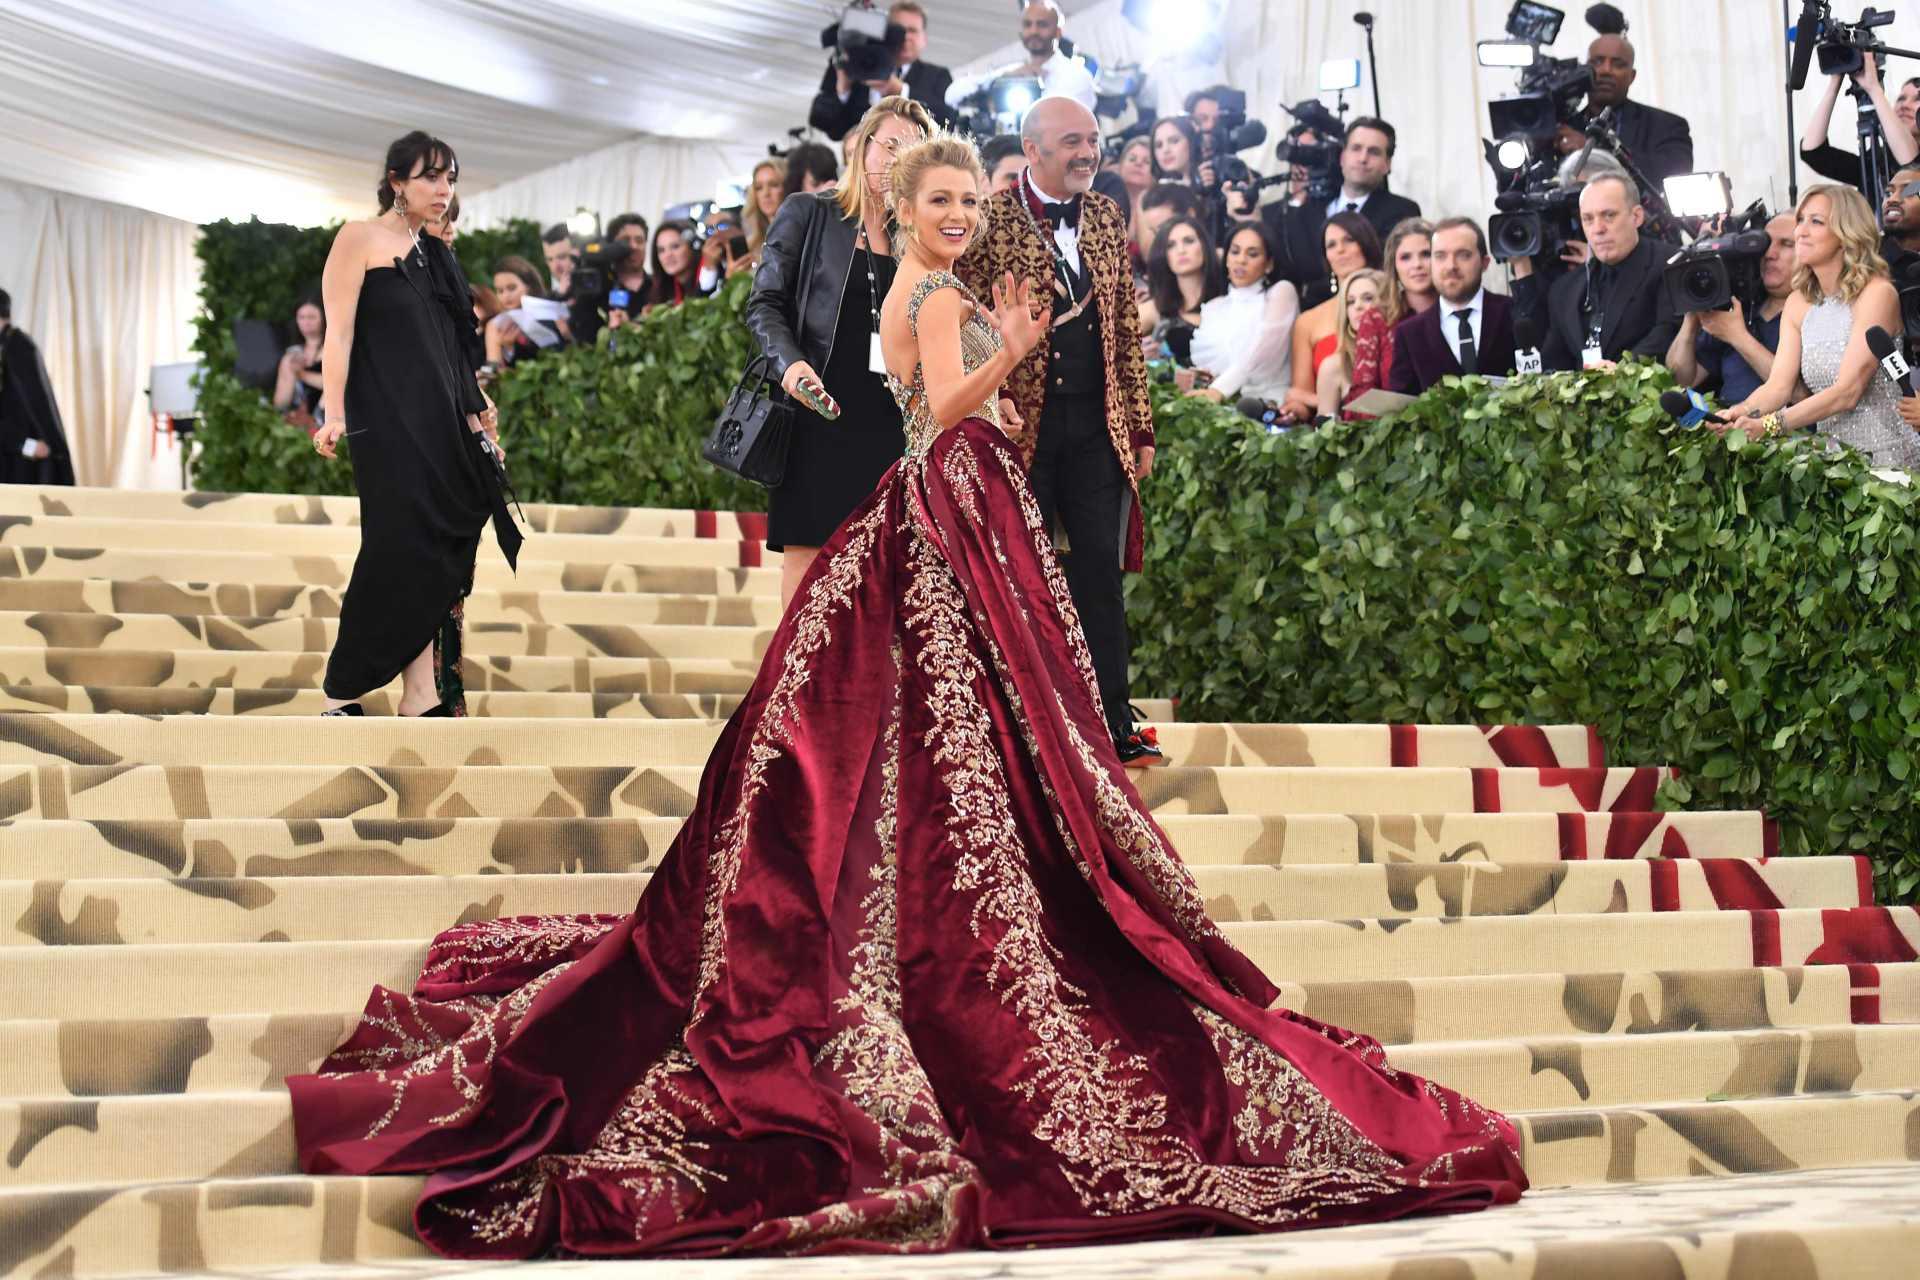 Heavenly Bodies MET Gala's 2018 Best Dressed Of The Evening 1